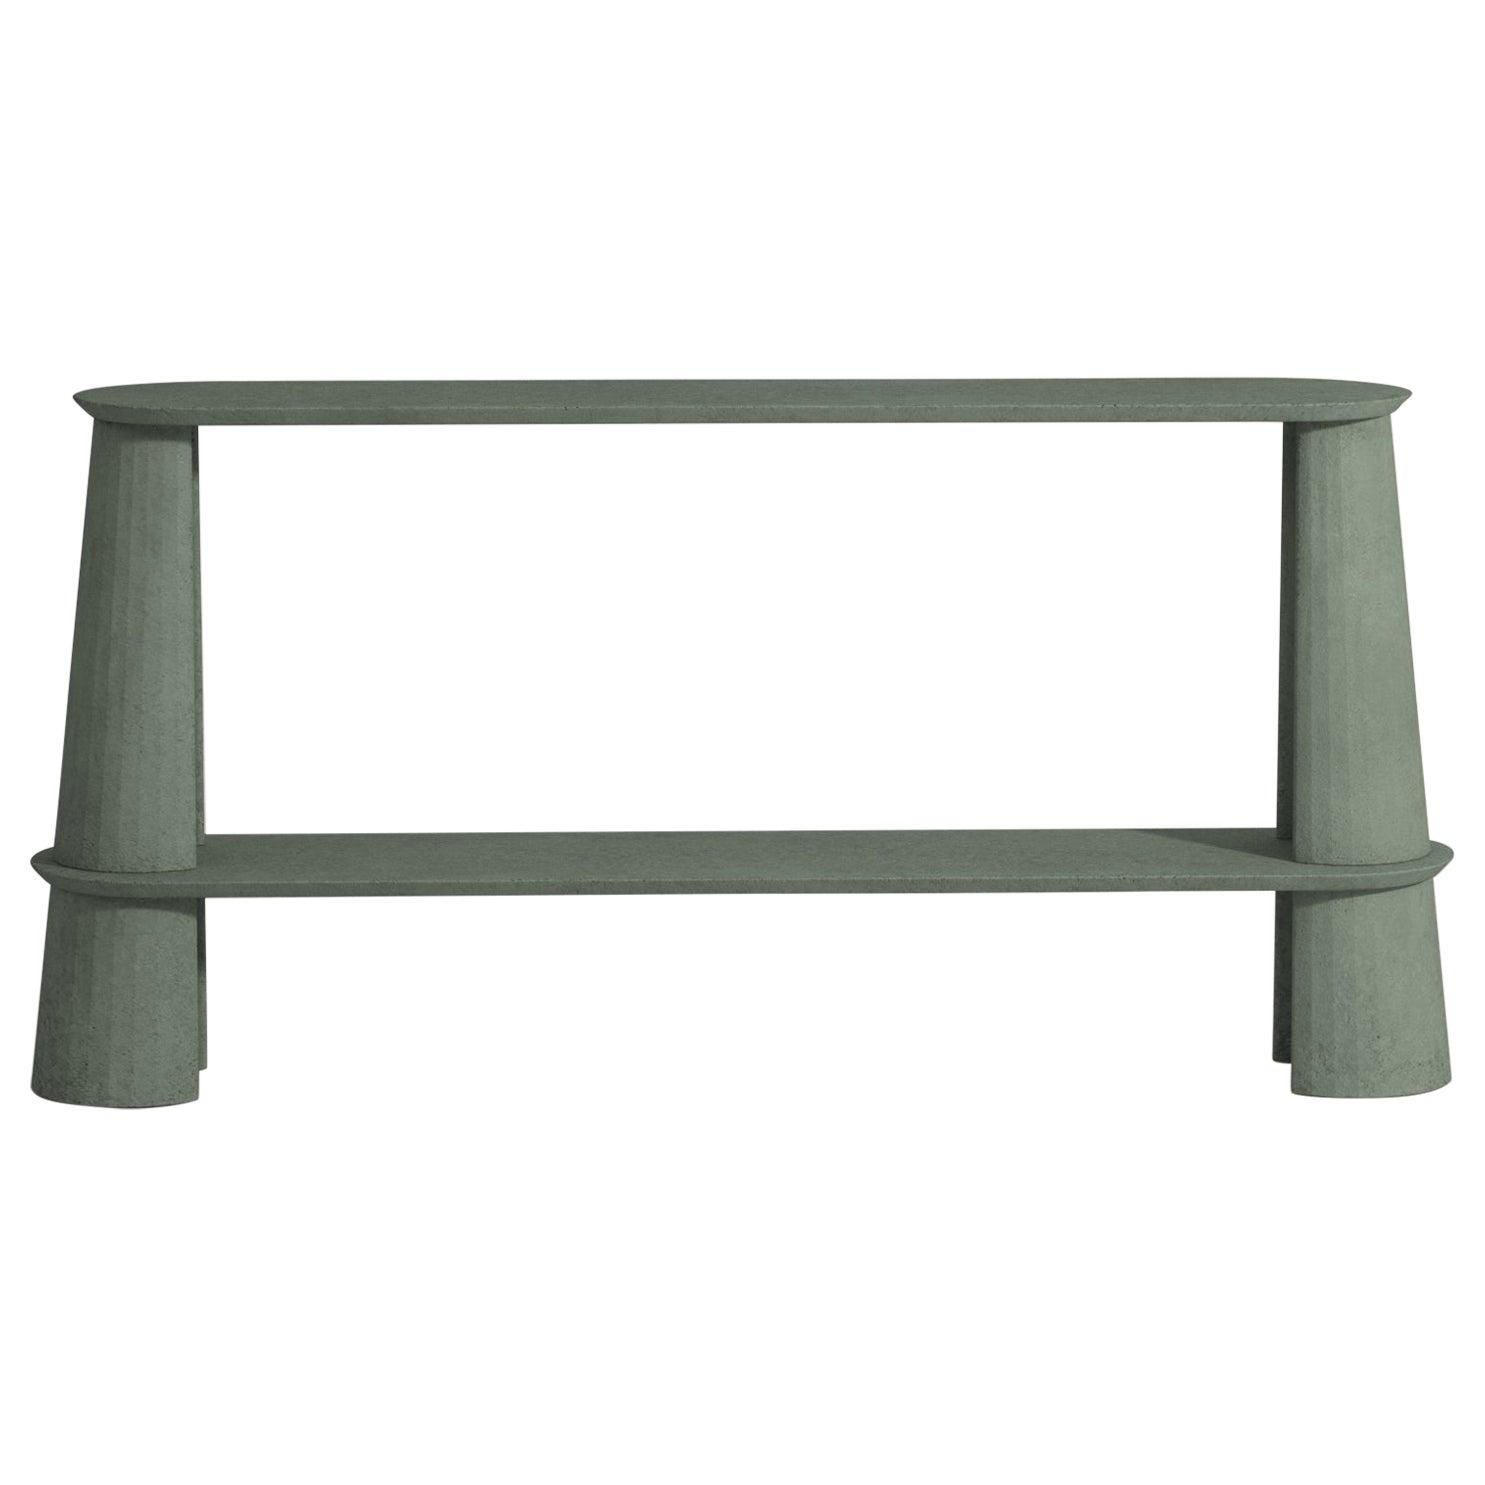 21st Century Studio Irvine Fusto Side Console Table Concrete Cement Green Fir